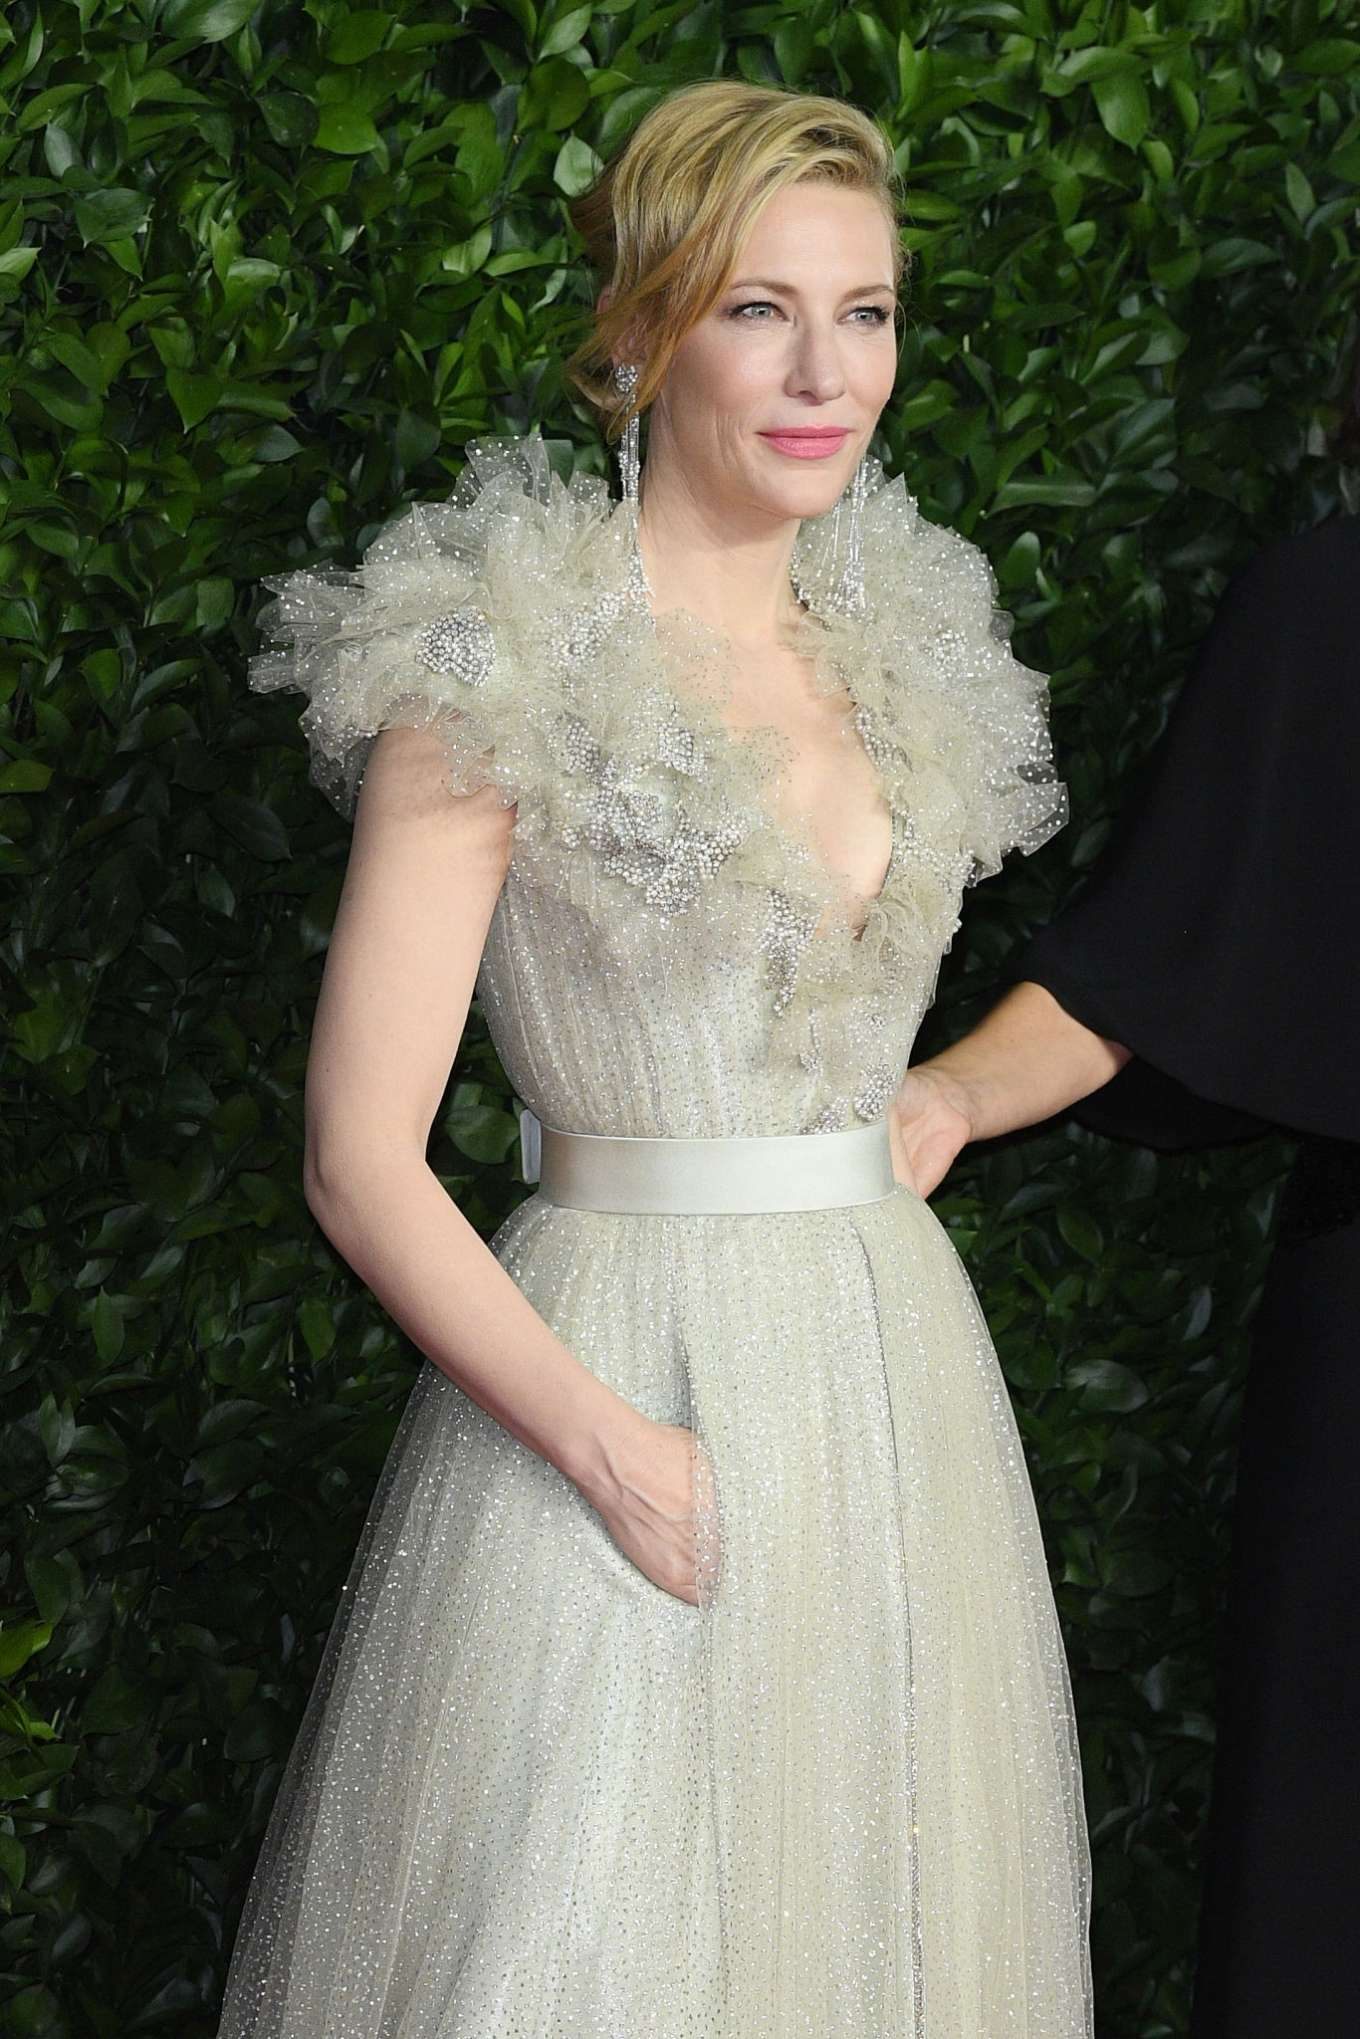 Cate Blanchett 2019 : Cate Blanchett – Fashion Awards 2019 in London-15